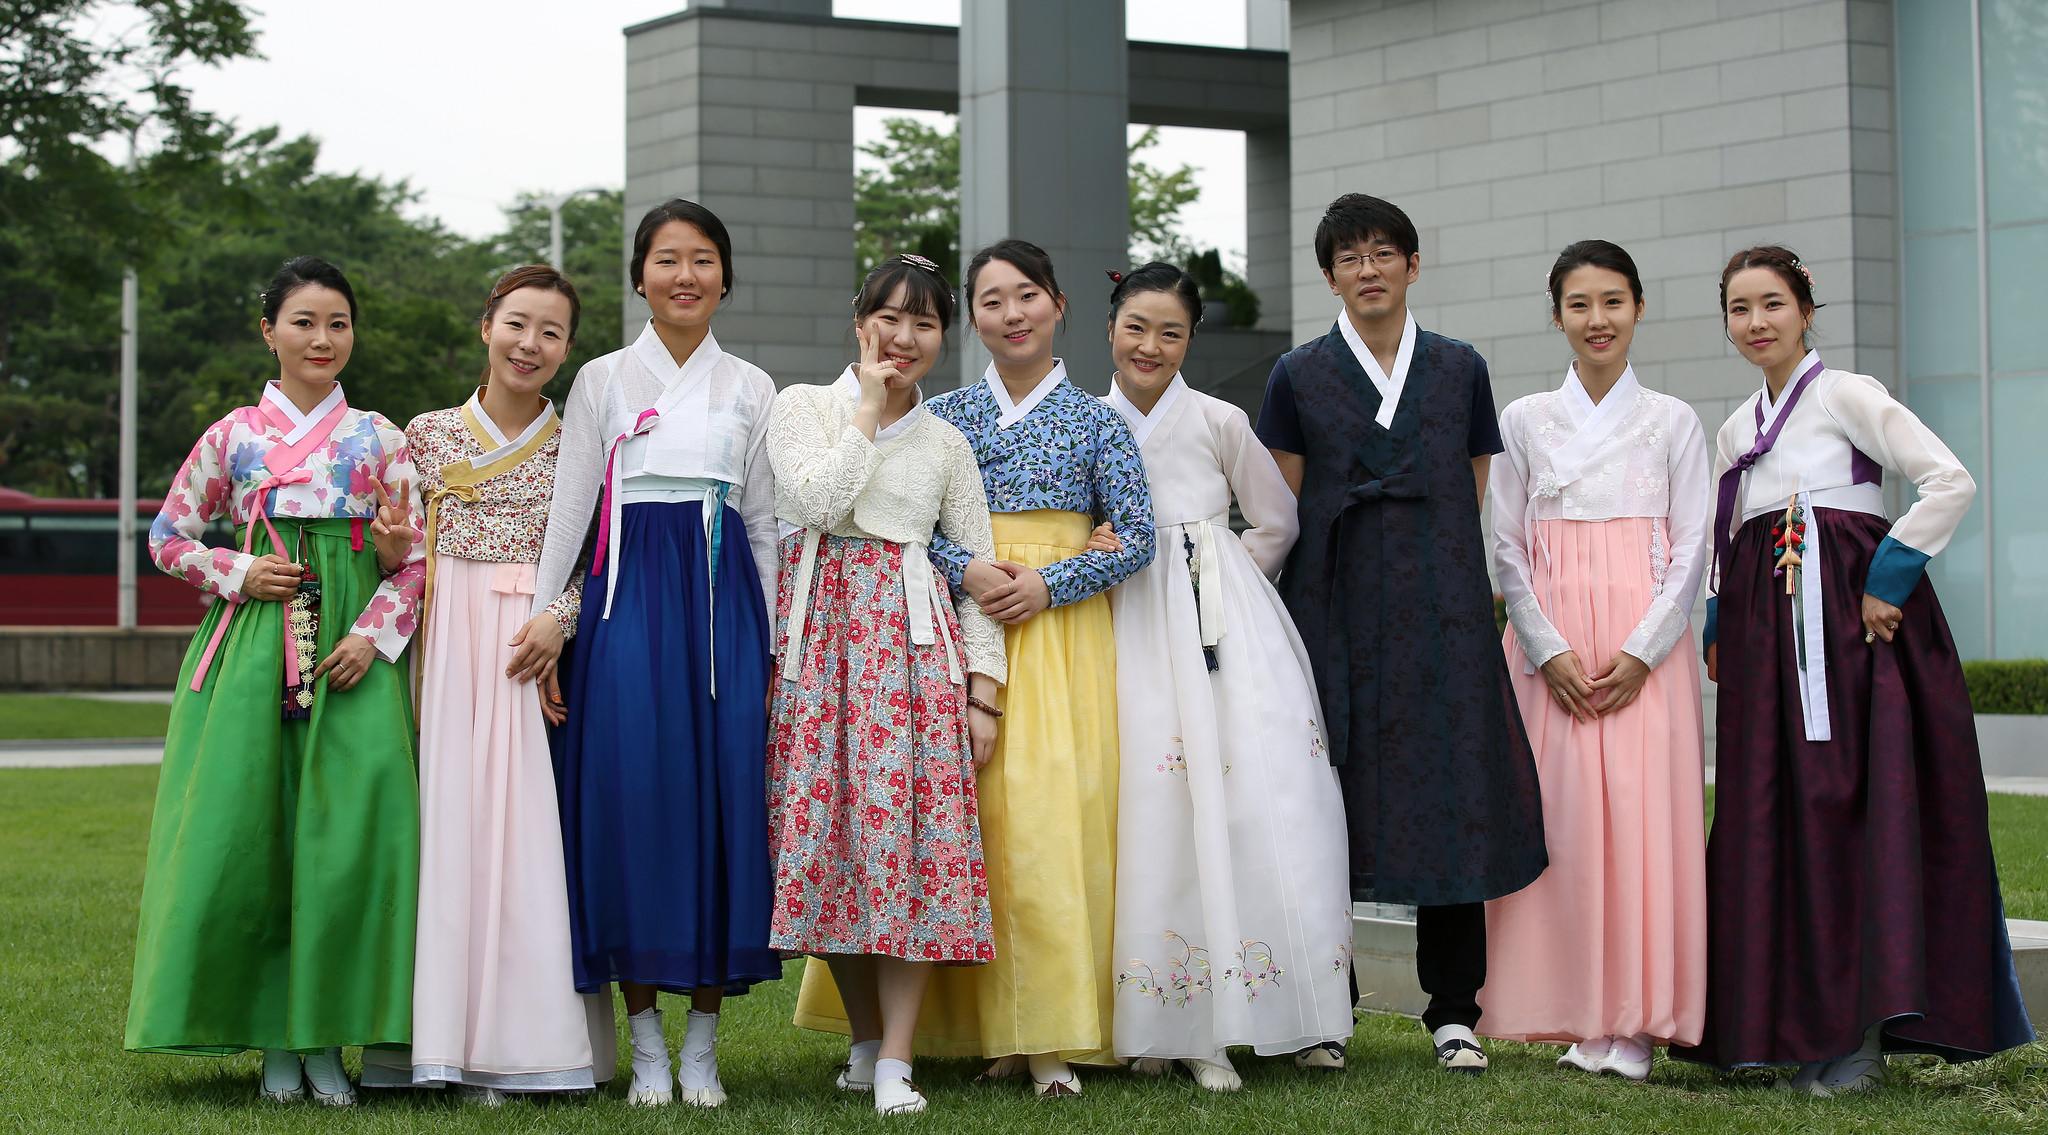 ffd229a49 Hanbok: An Introduction to South Korea's National Dress